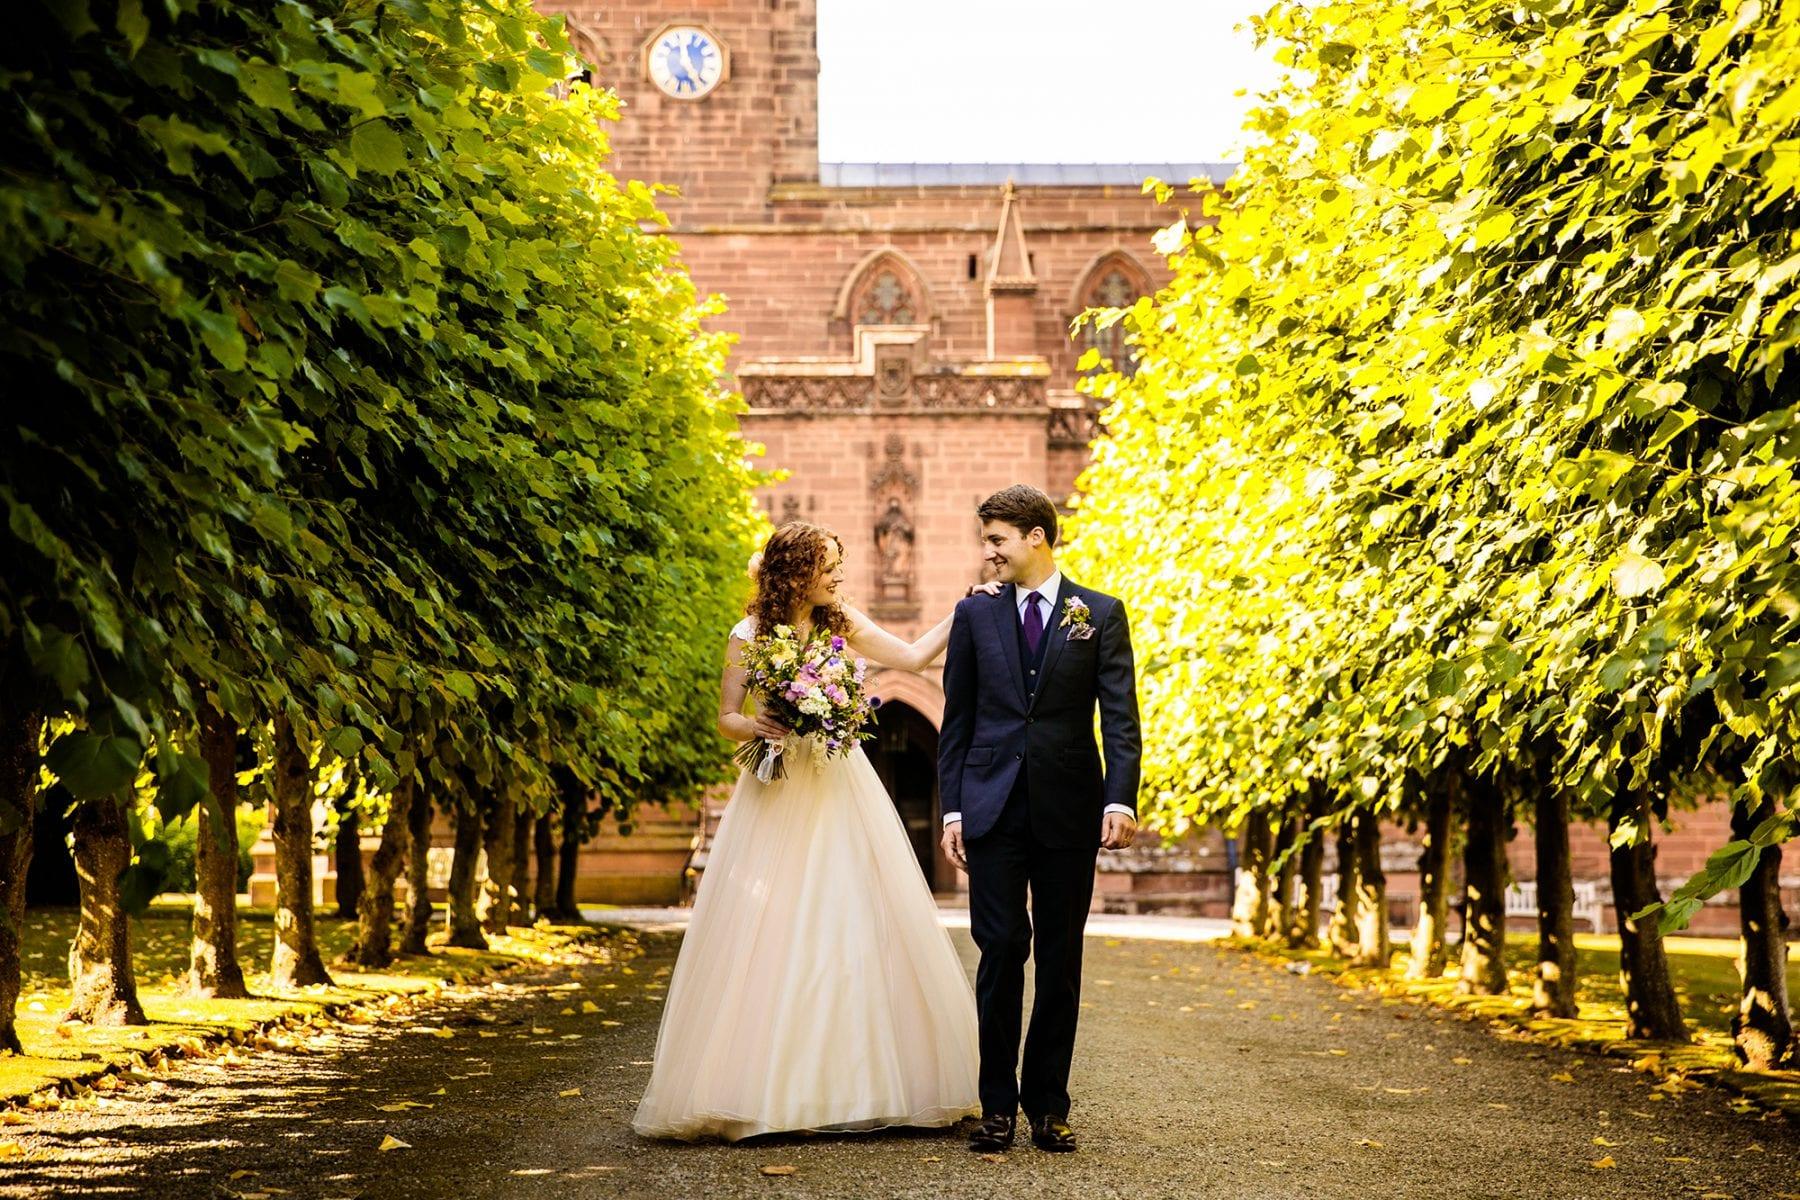 Wedding Photographs St. Mary's Eccleston